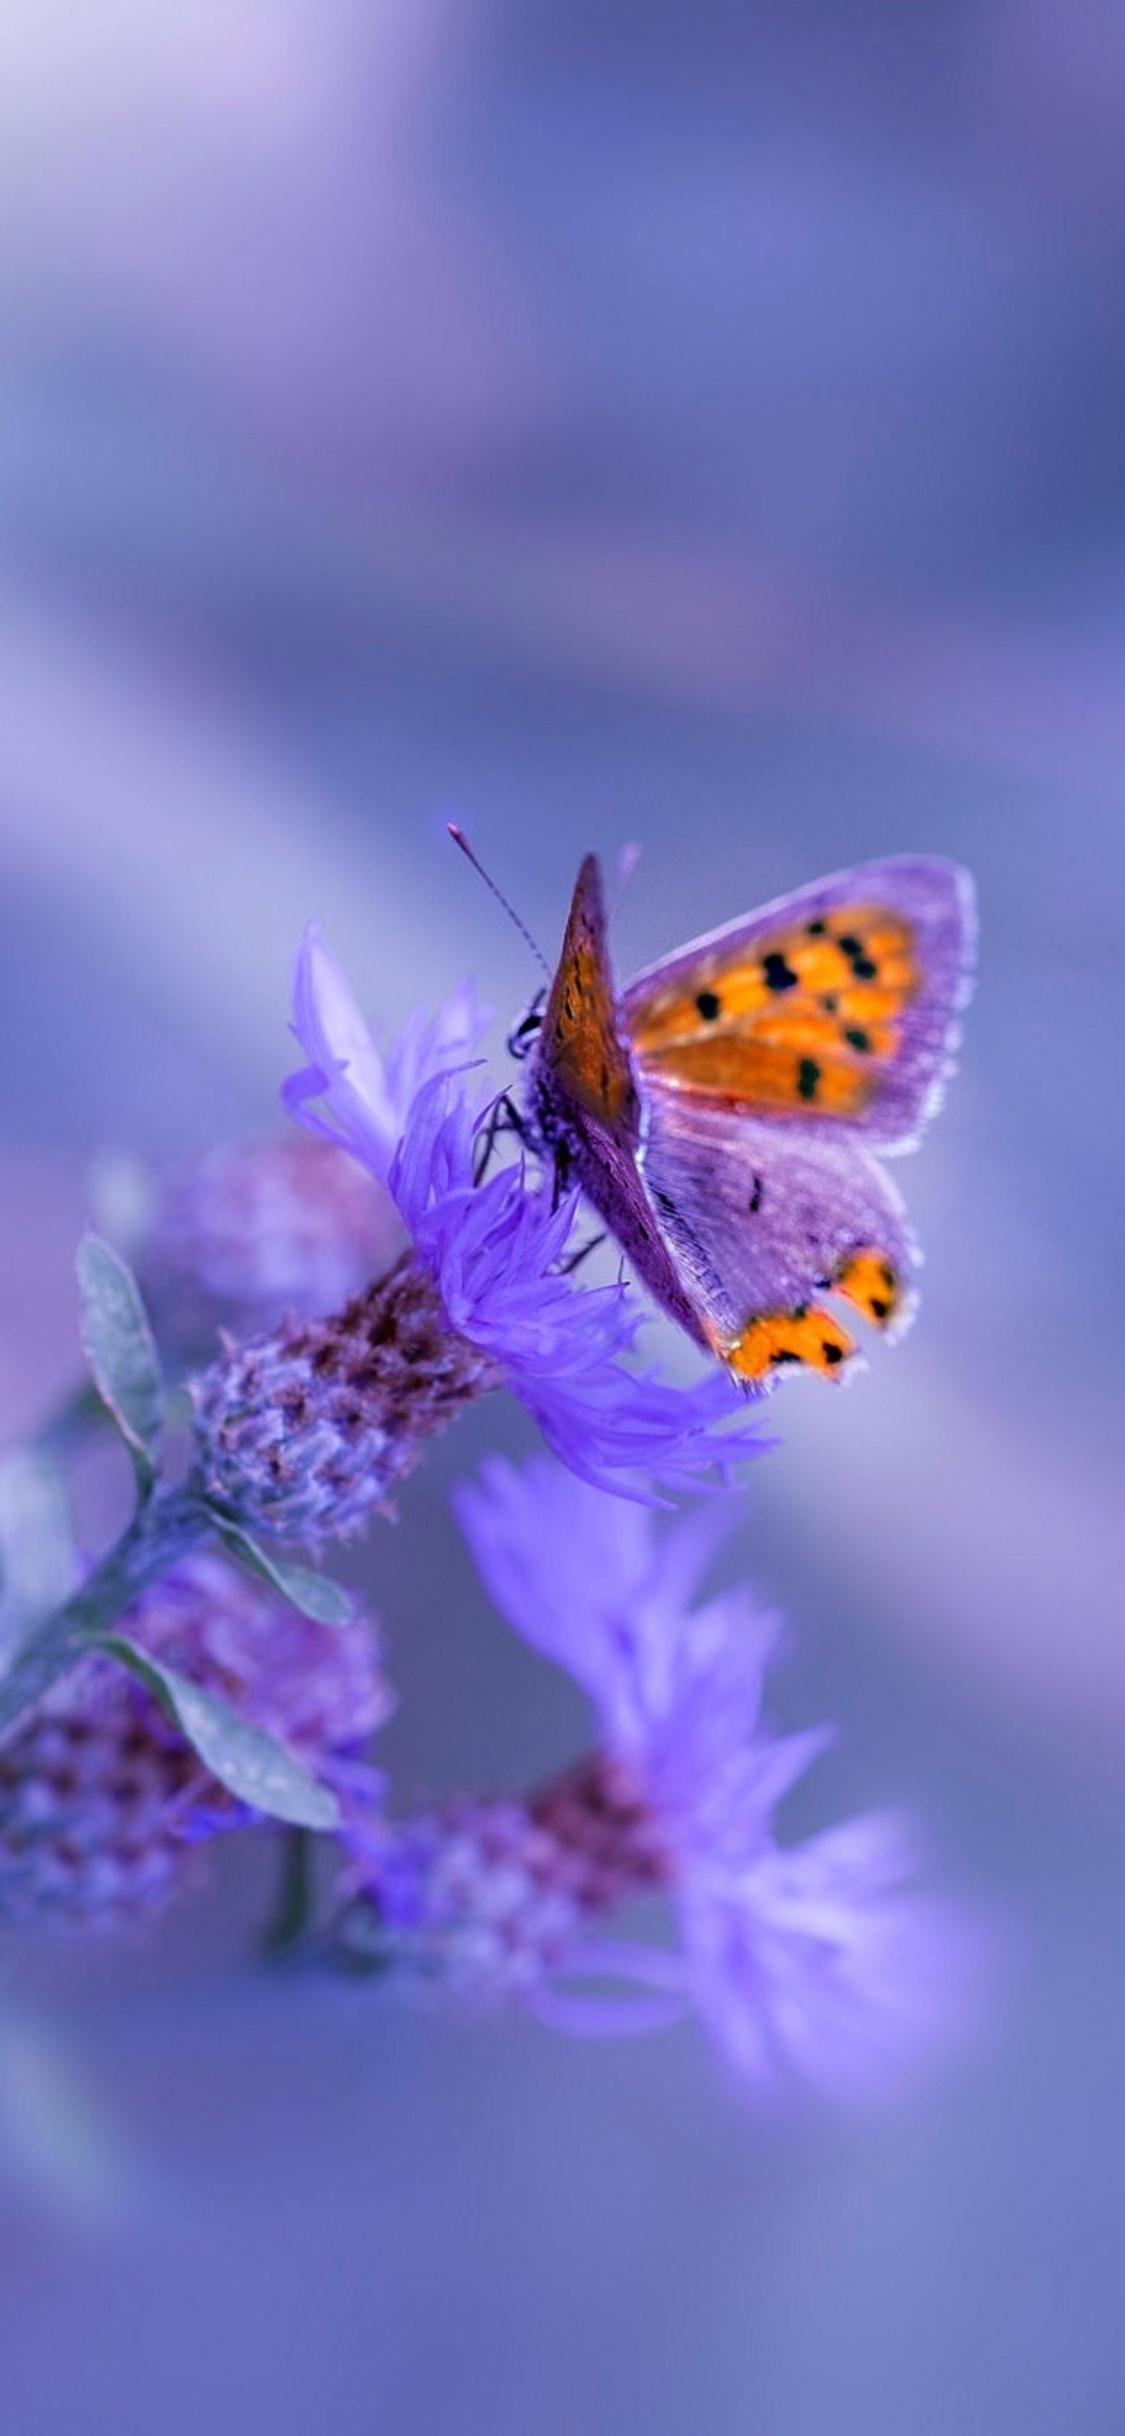 1125x2436 Butterfly Purple Flower Iphone Xs Iphone 10 Iphone X Hd 4k